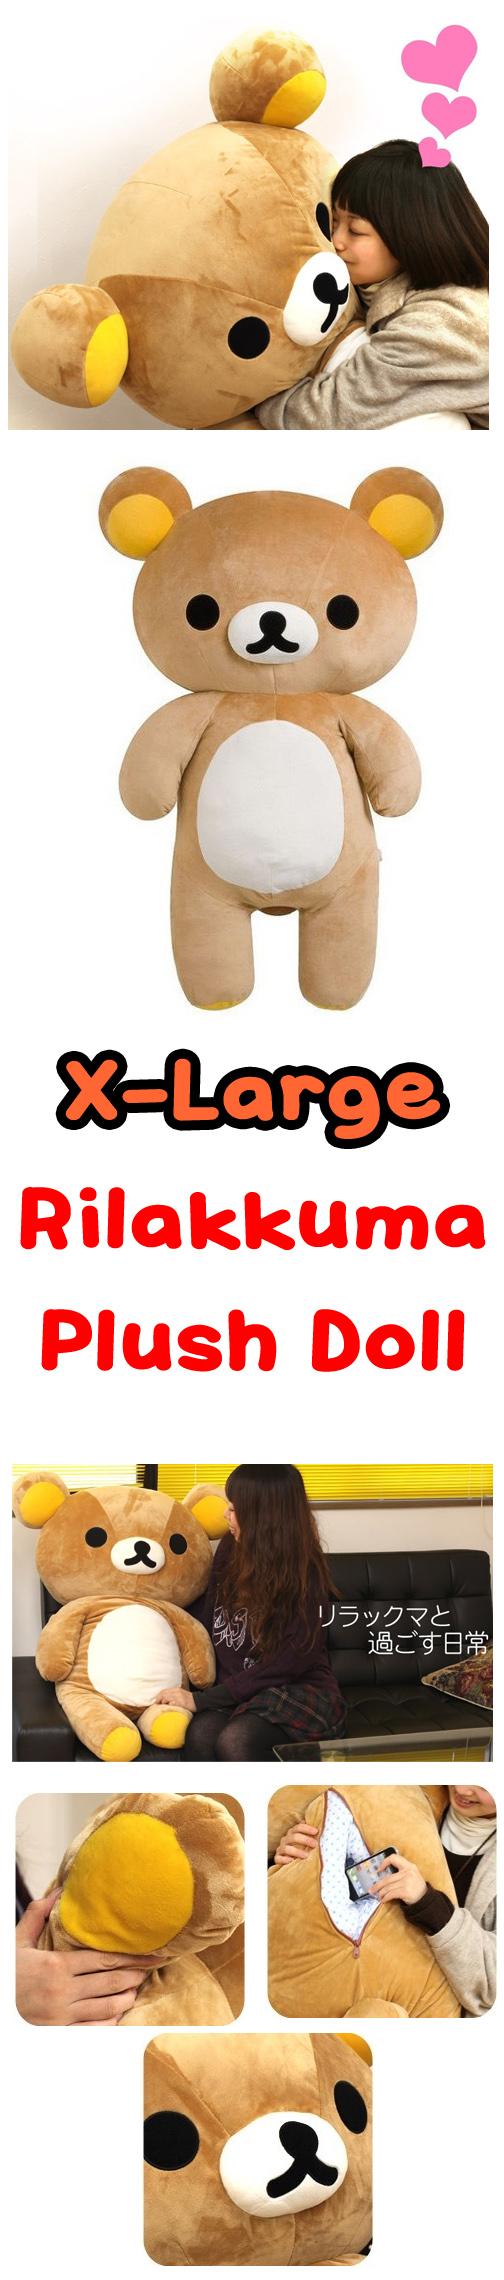 Rilakkuma San X Plush Doll XL size